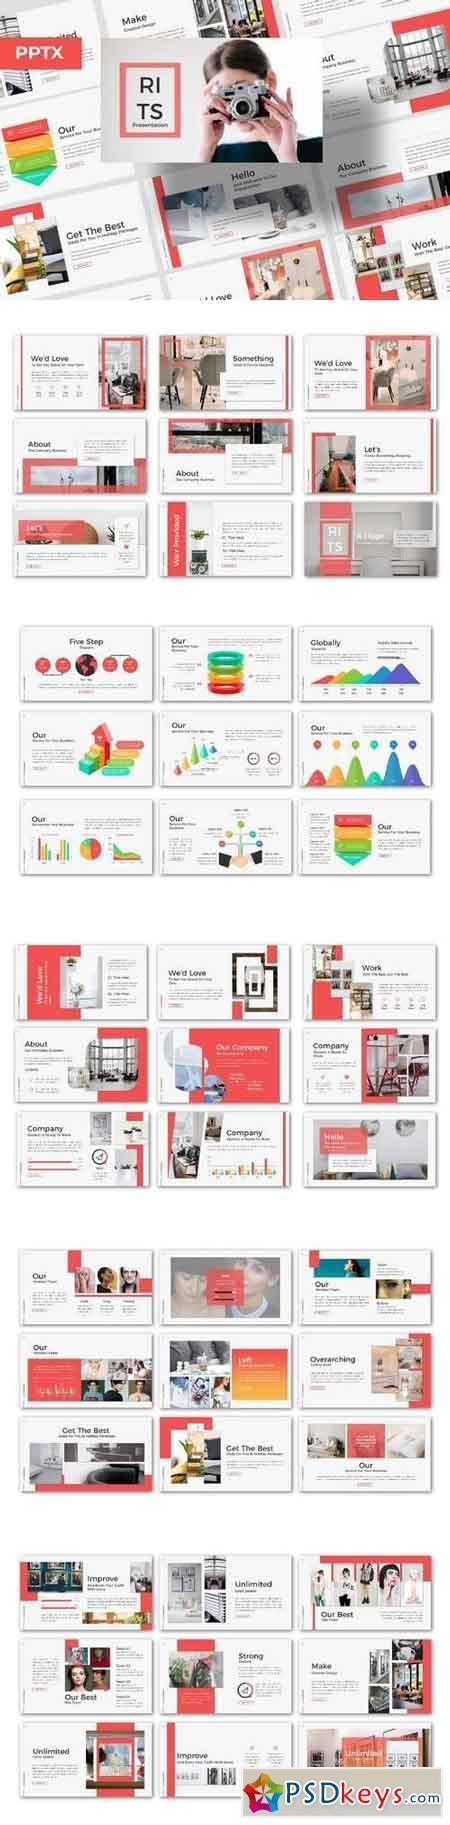 RITS Powerpoint - Powerpoint, Keynote, Google Sliders Templates